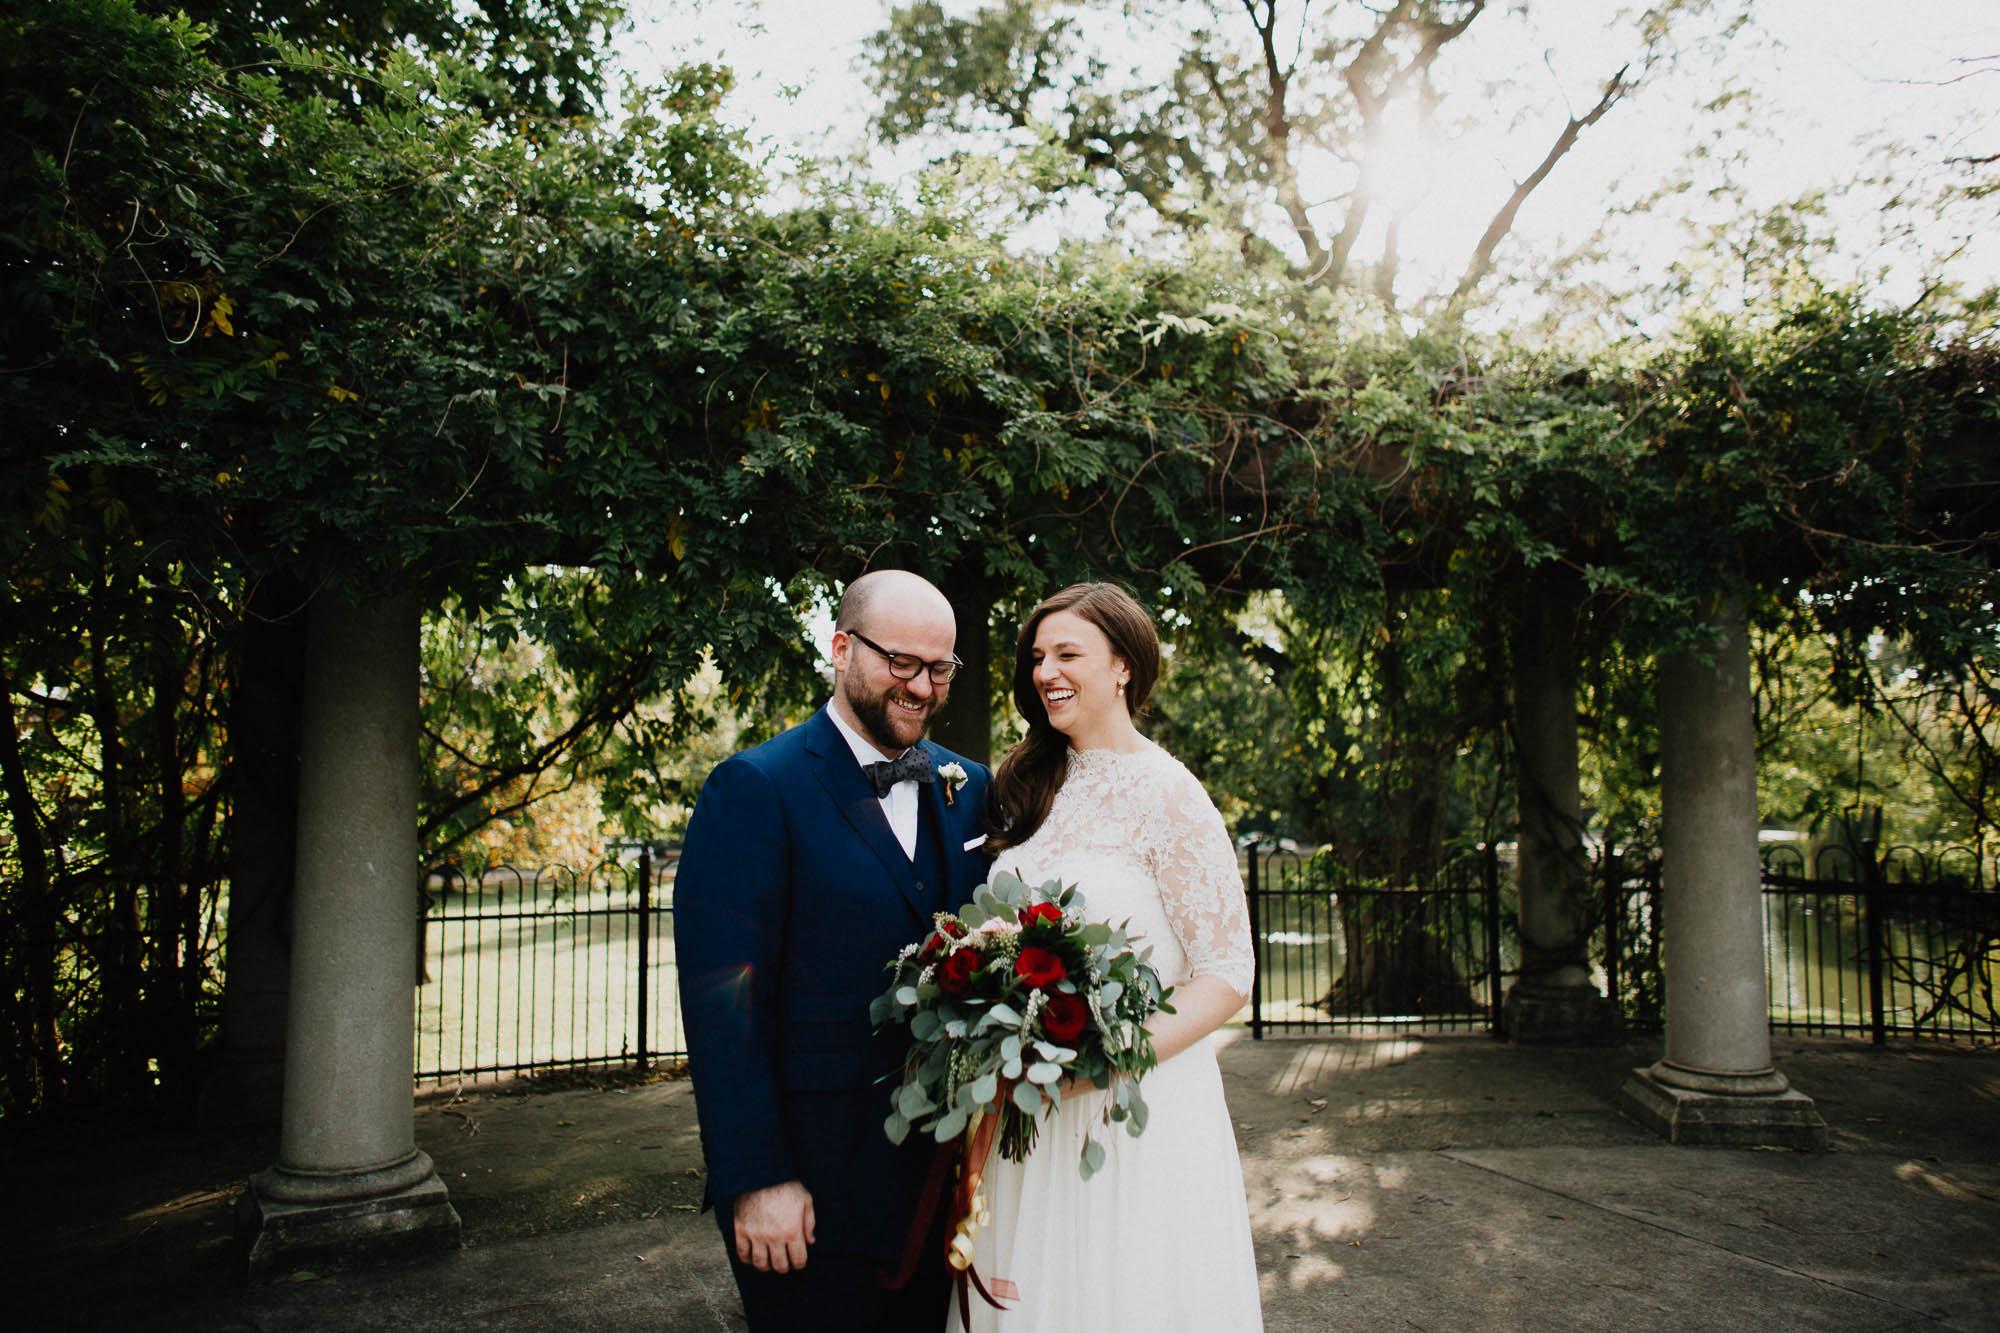 Highline-Car-House-Wedding-Columbus-Kristin-Aaron-044.jpg